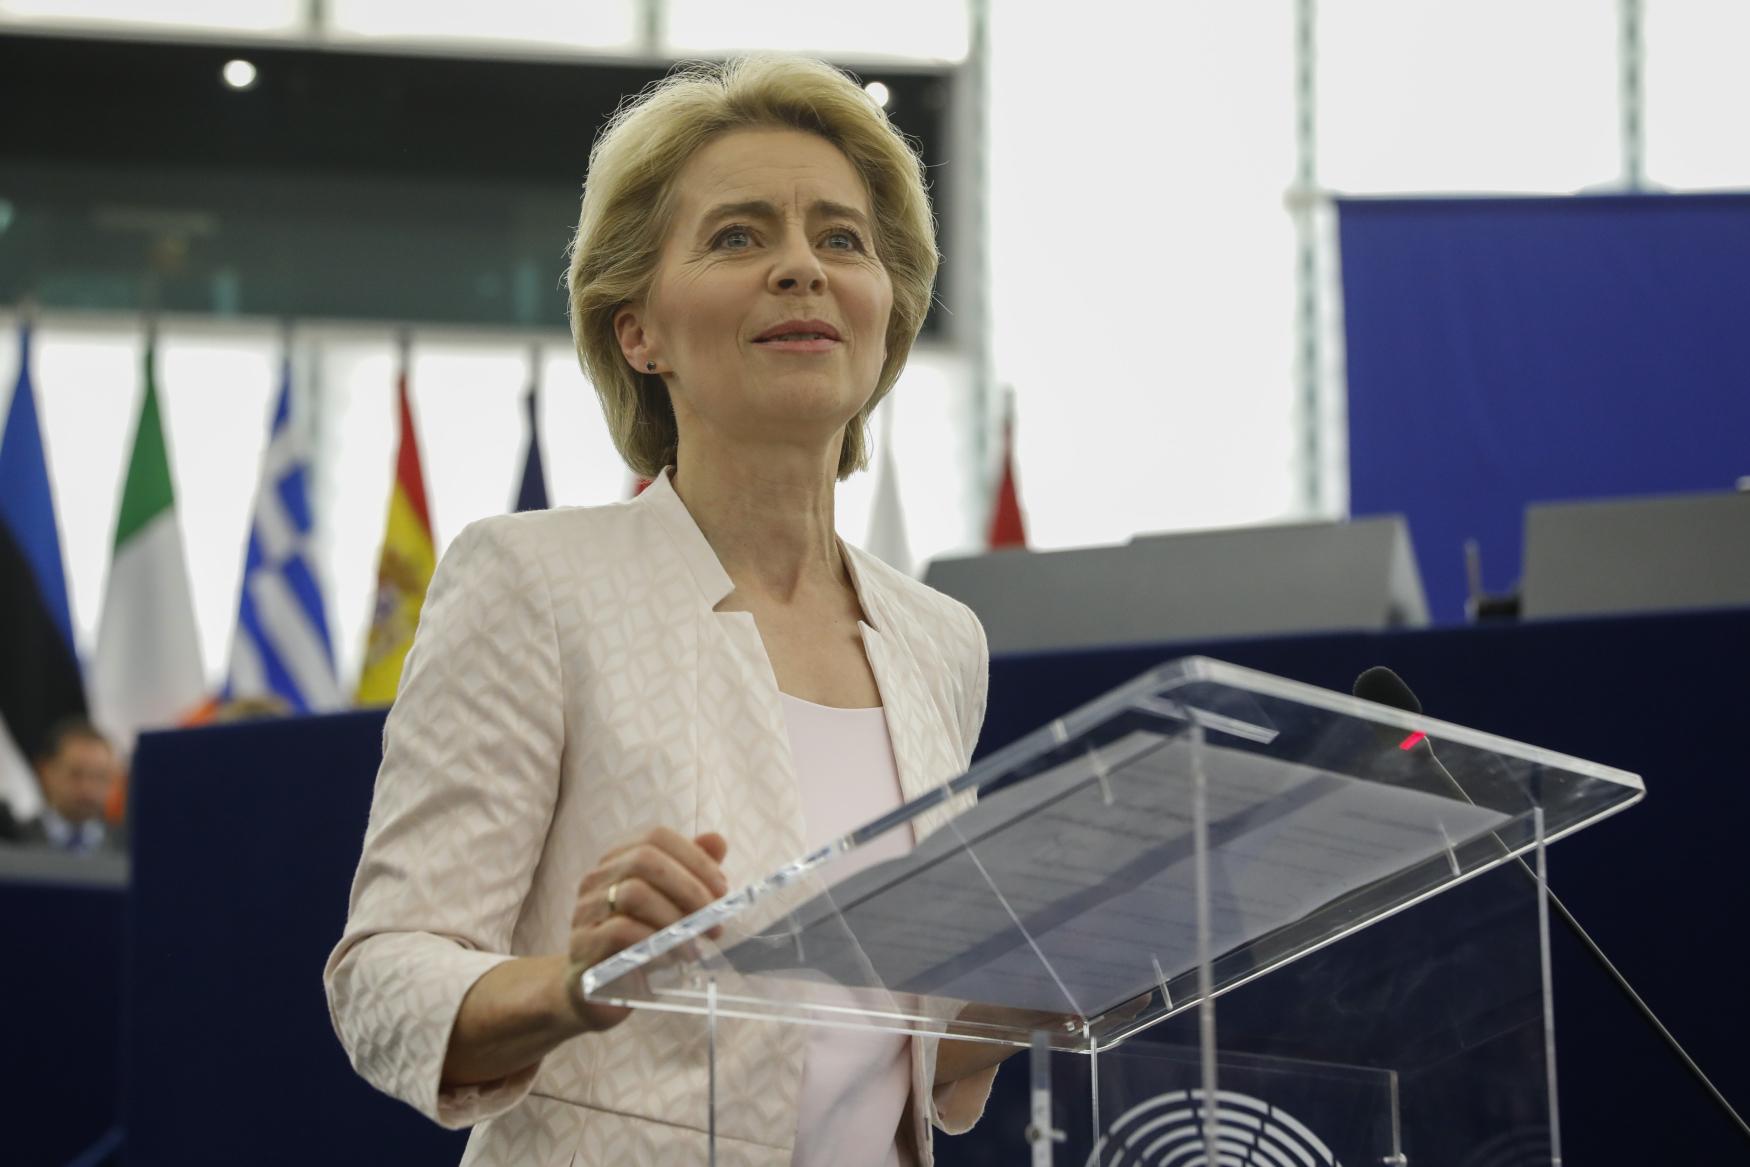 Ursula von der Leyen's election greeted with mixed feelings | Radio Prague